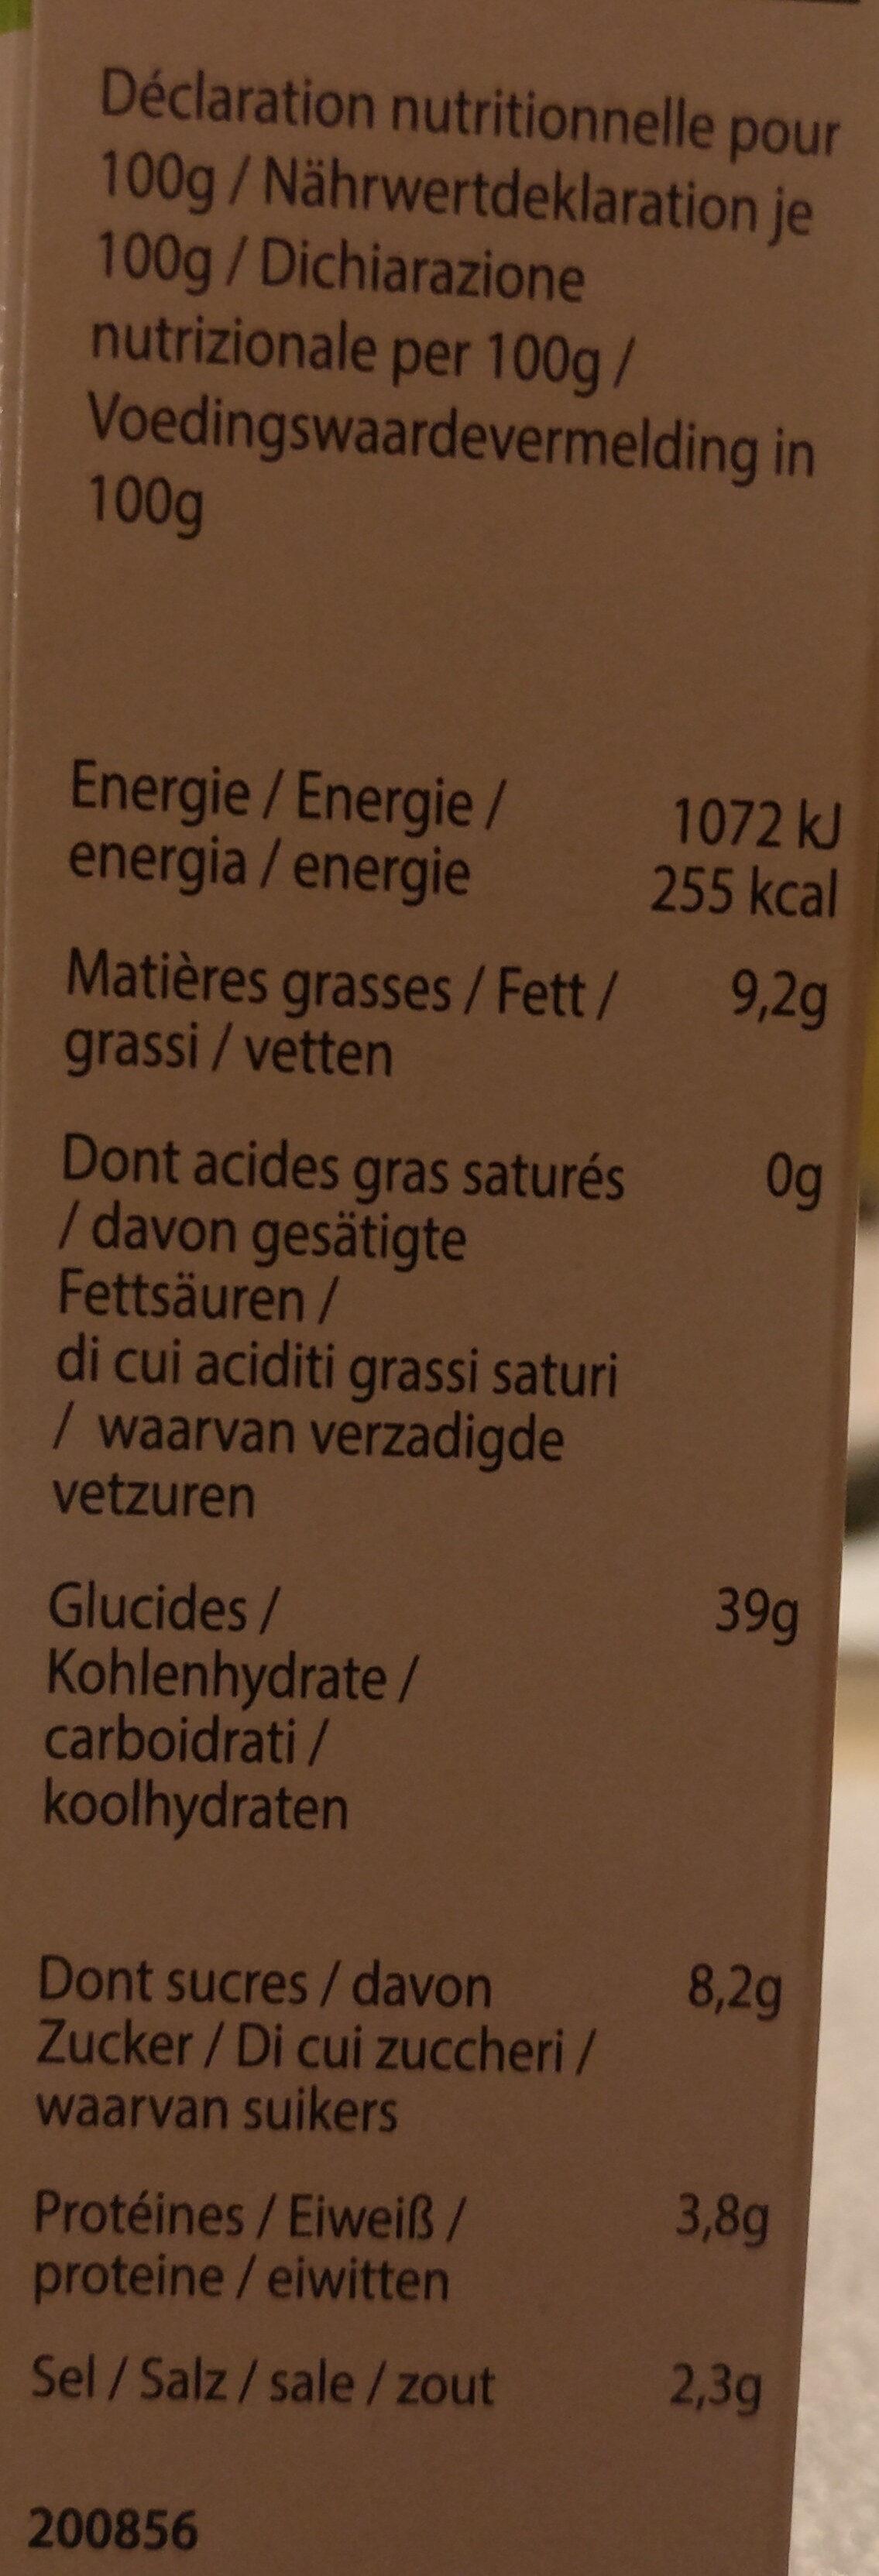 Pate de wasabi - Nutrition facts - fr